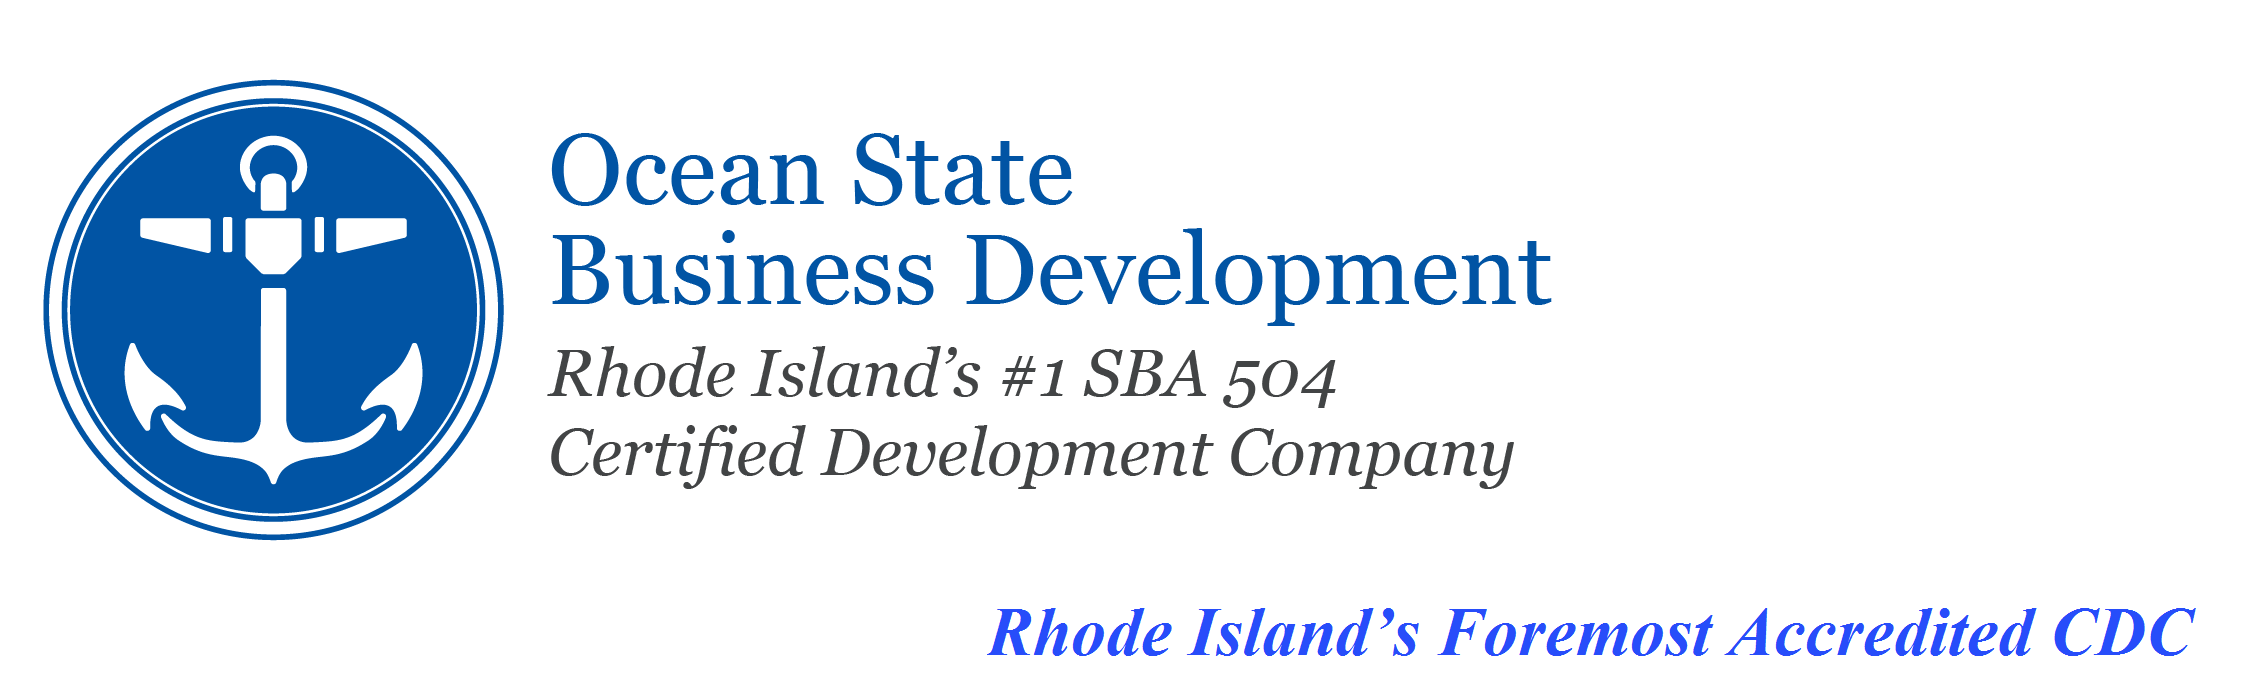 Ocean State Business Development Authority